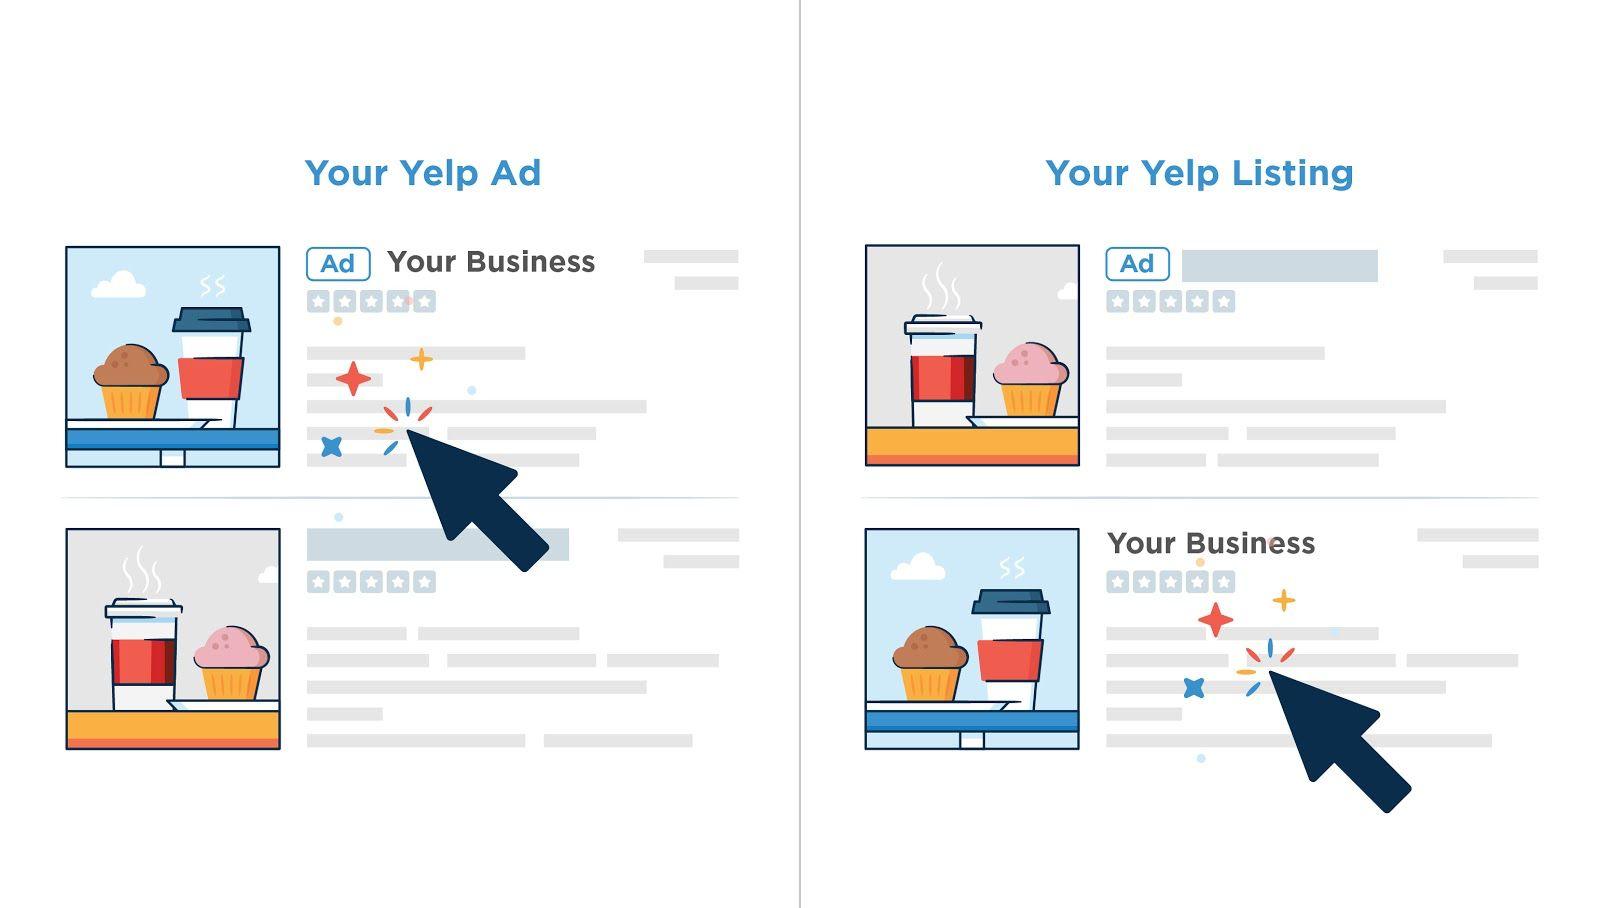 yelp ad vs yelp listing.jpg